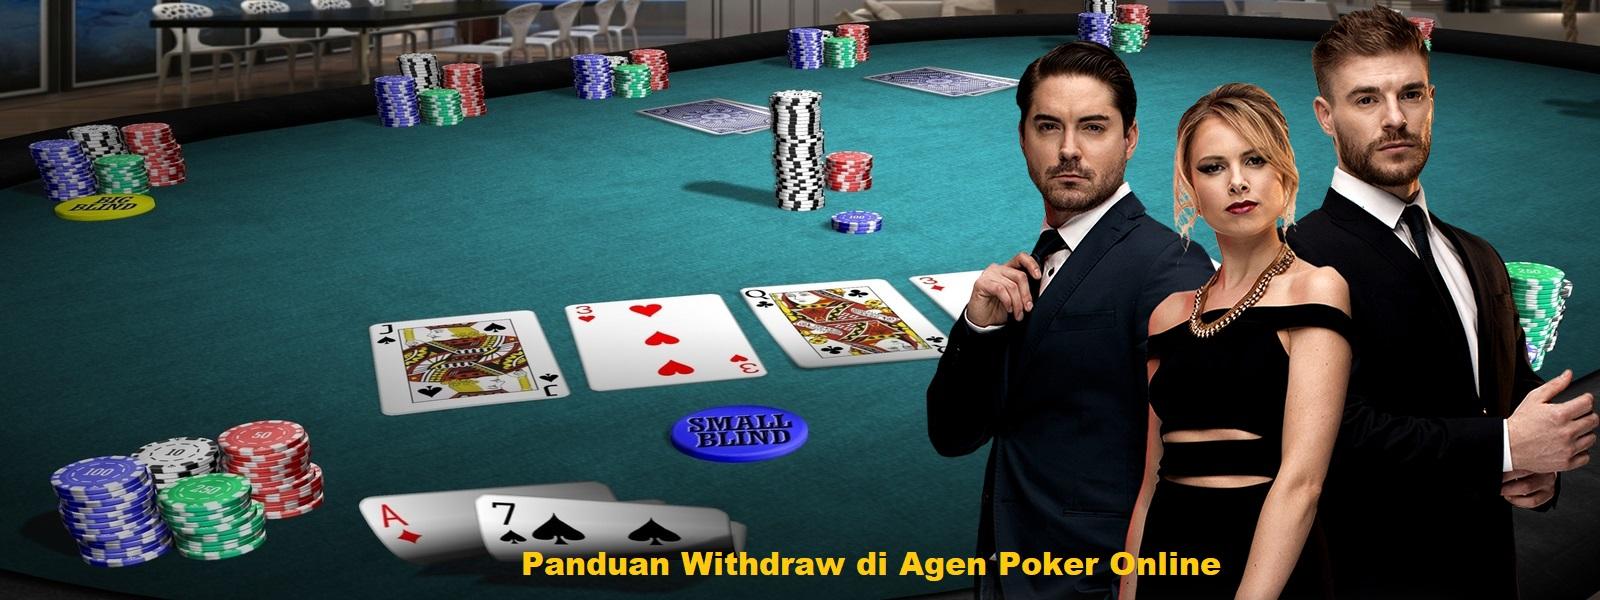 Panduan Withdraw di Agen Poker Online